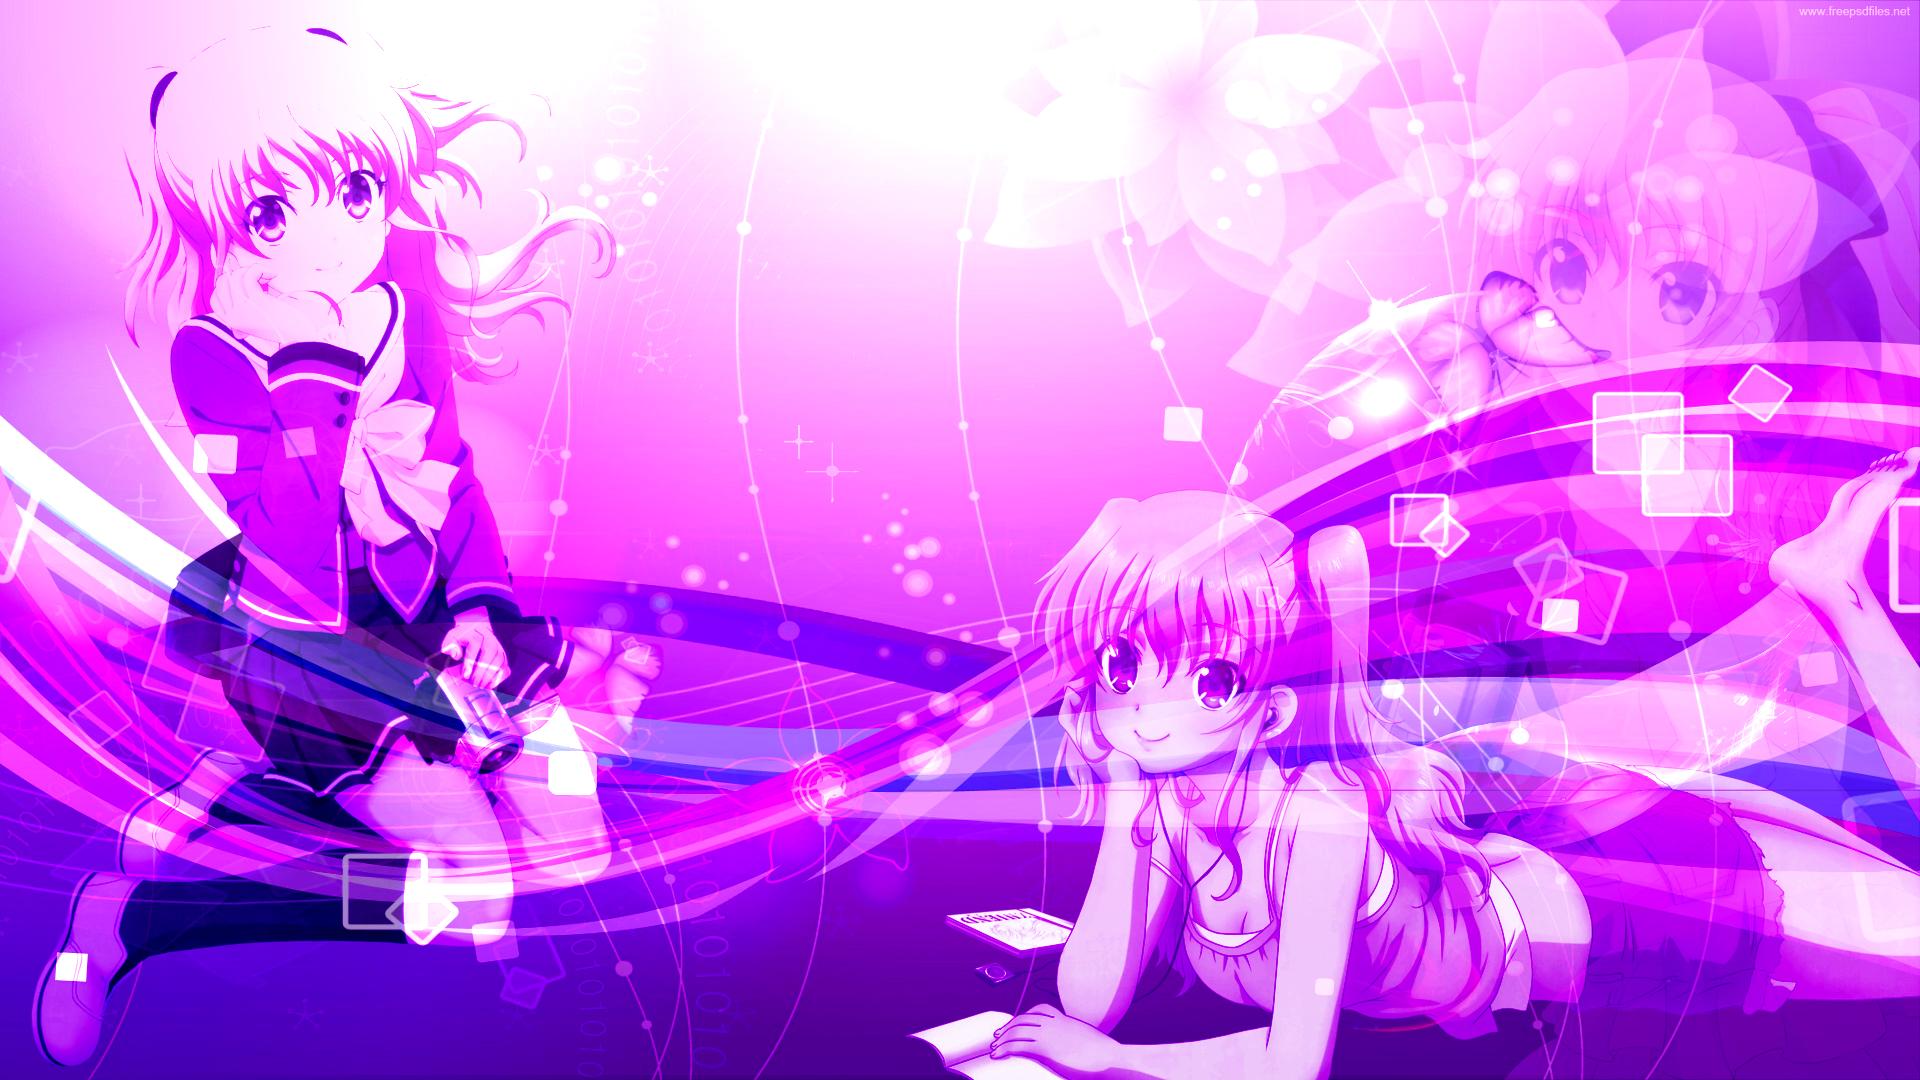 Anime Cute Wallpaper Hd Highschool Girls Anime Charlotte Backgrounds Pixelstalk Net